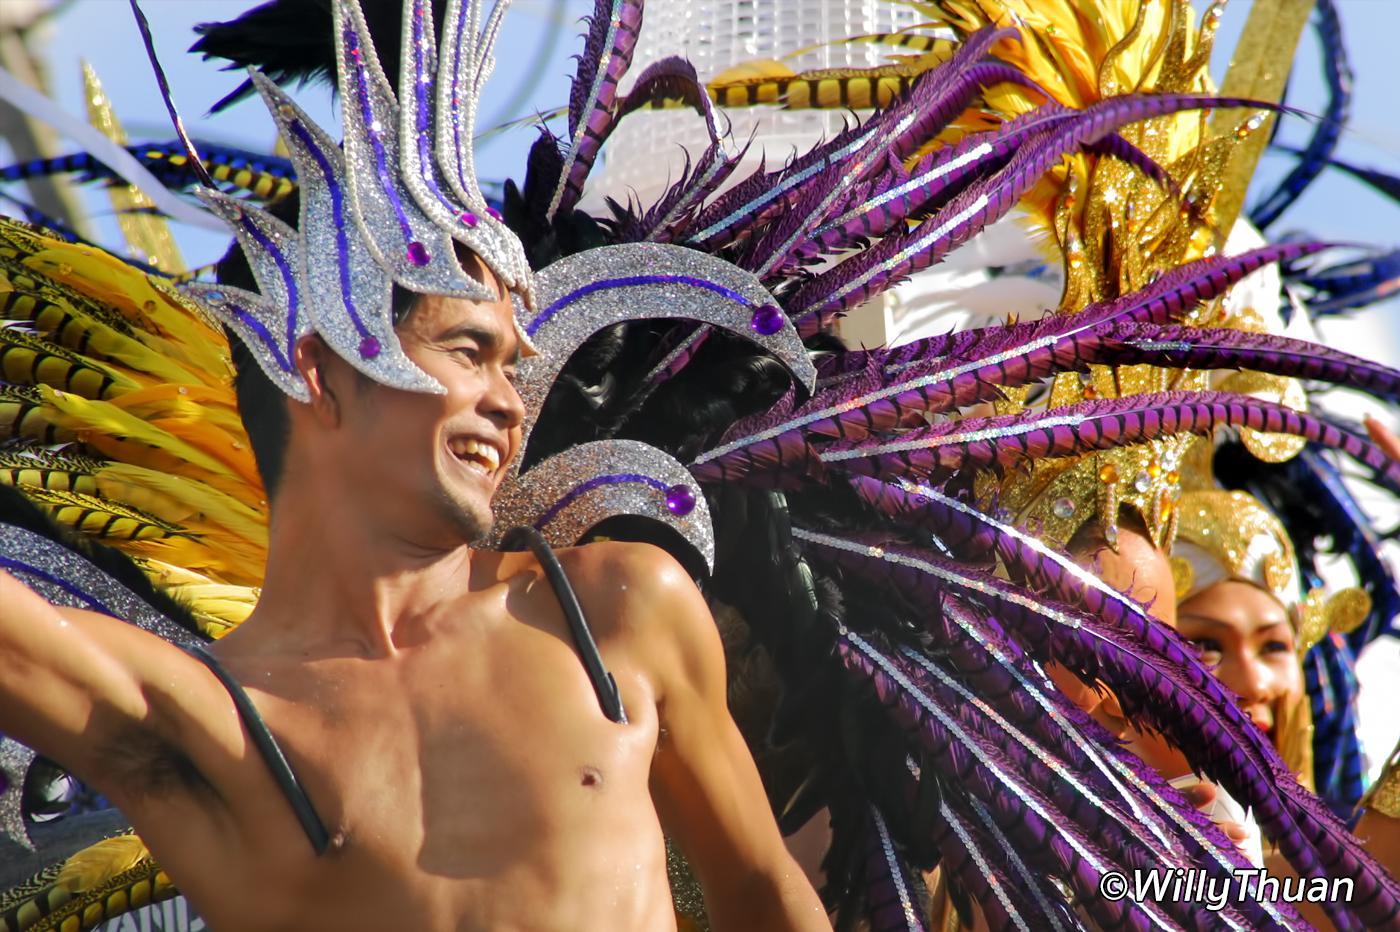 Phuket Gay Festival 2016 (Phuket Pride) and Gay Phuket